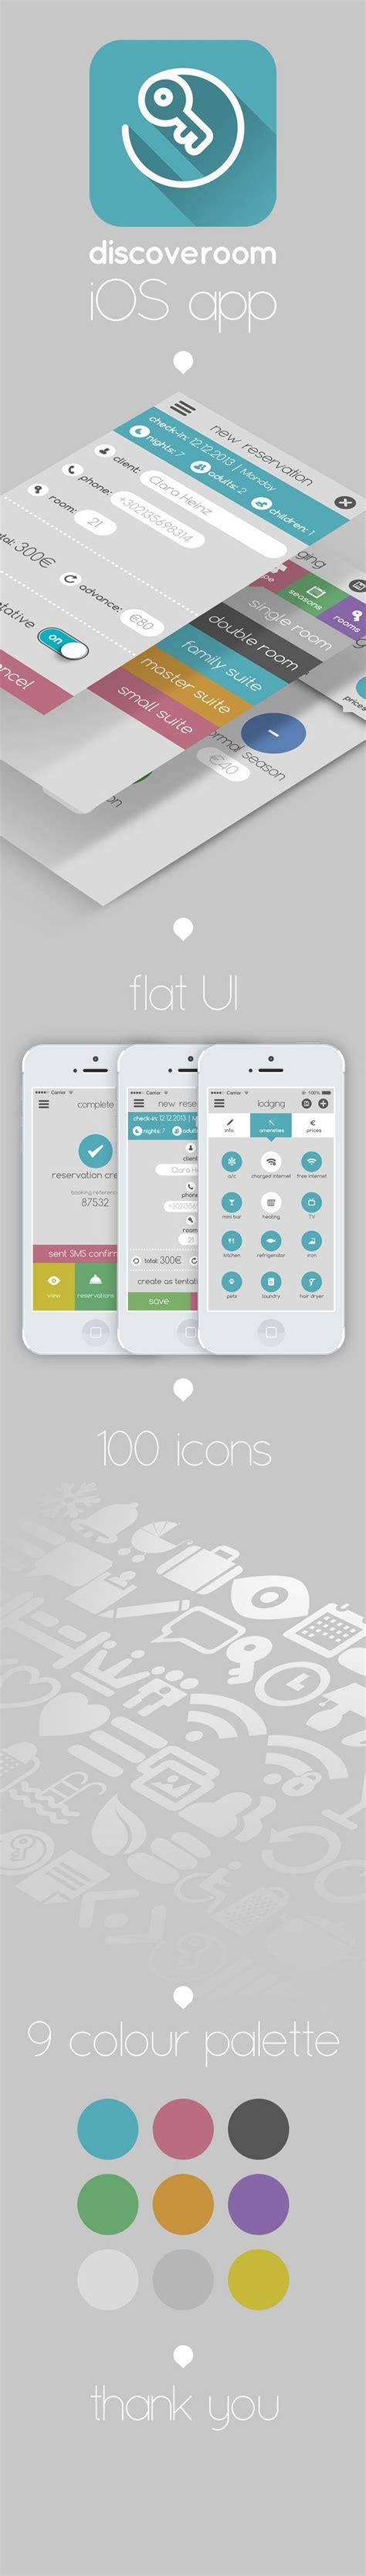 design inspiration ios 17 best ideas about ios app icon on pinterest app icon